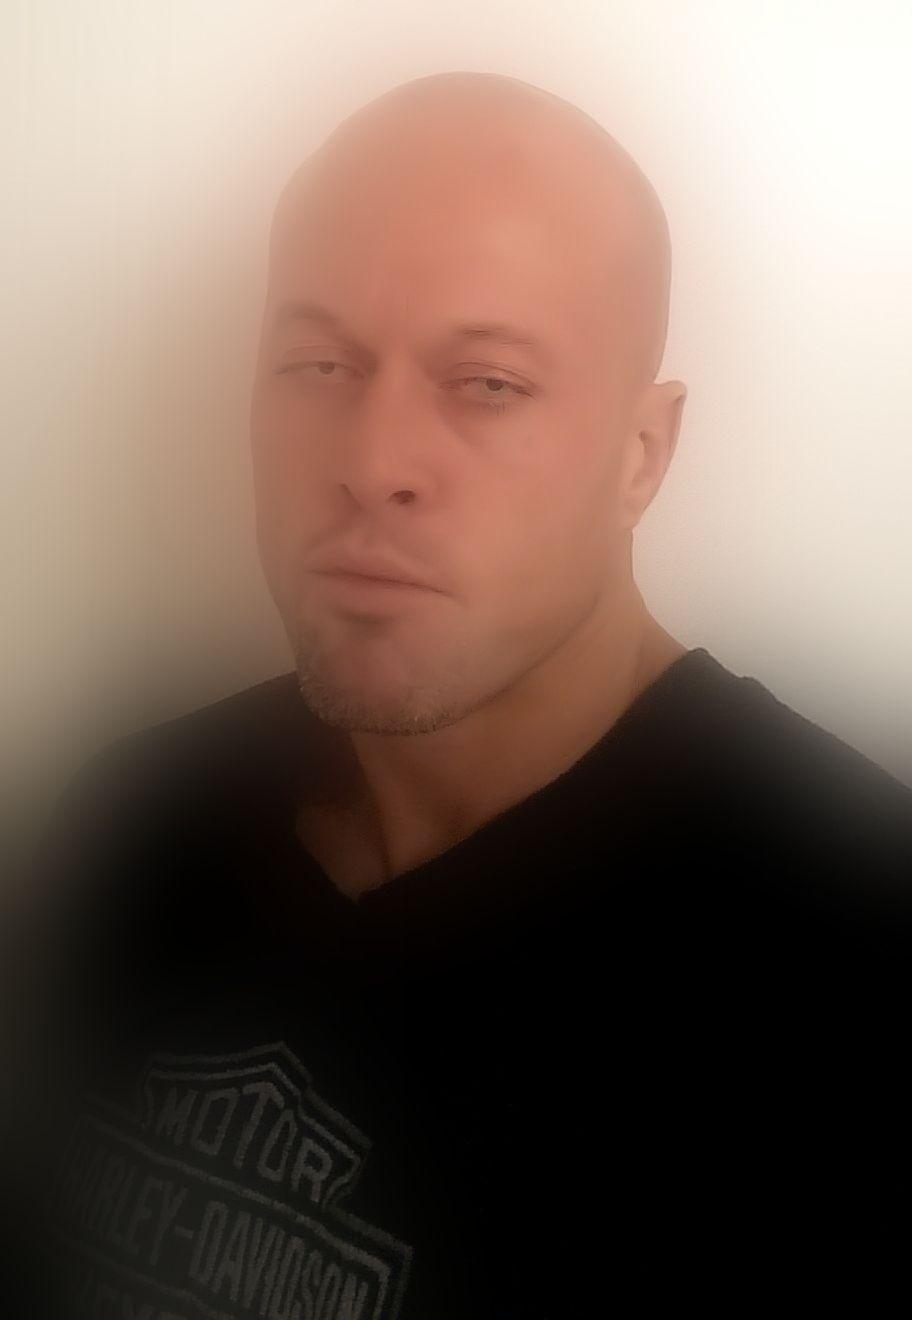 John Joseph Quinlan Physique Romance Tattoo Model Featured Profie 2014